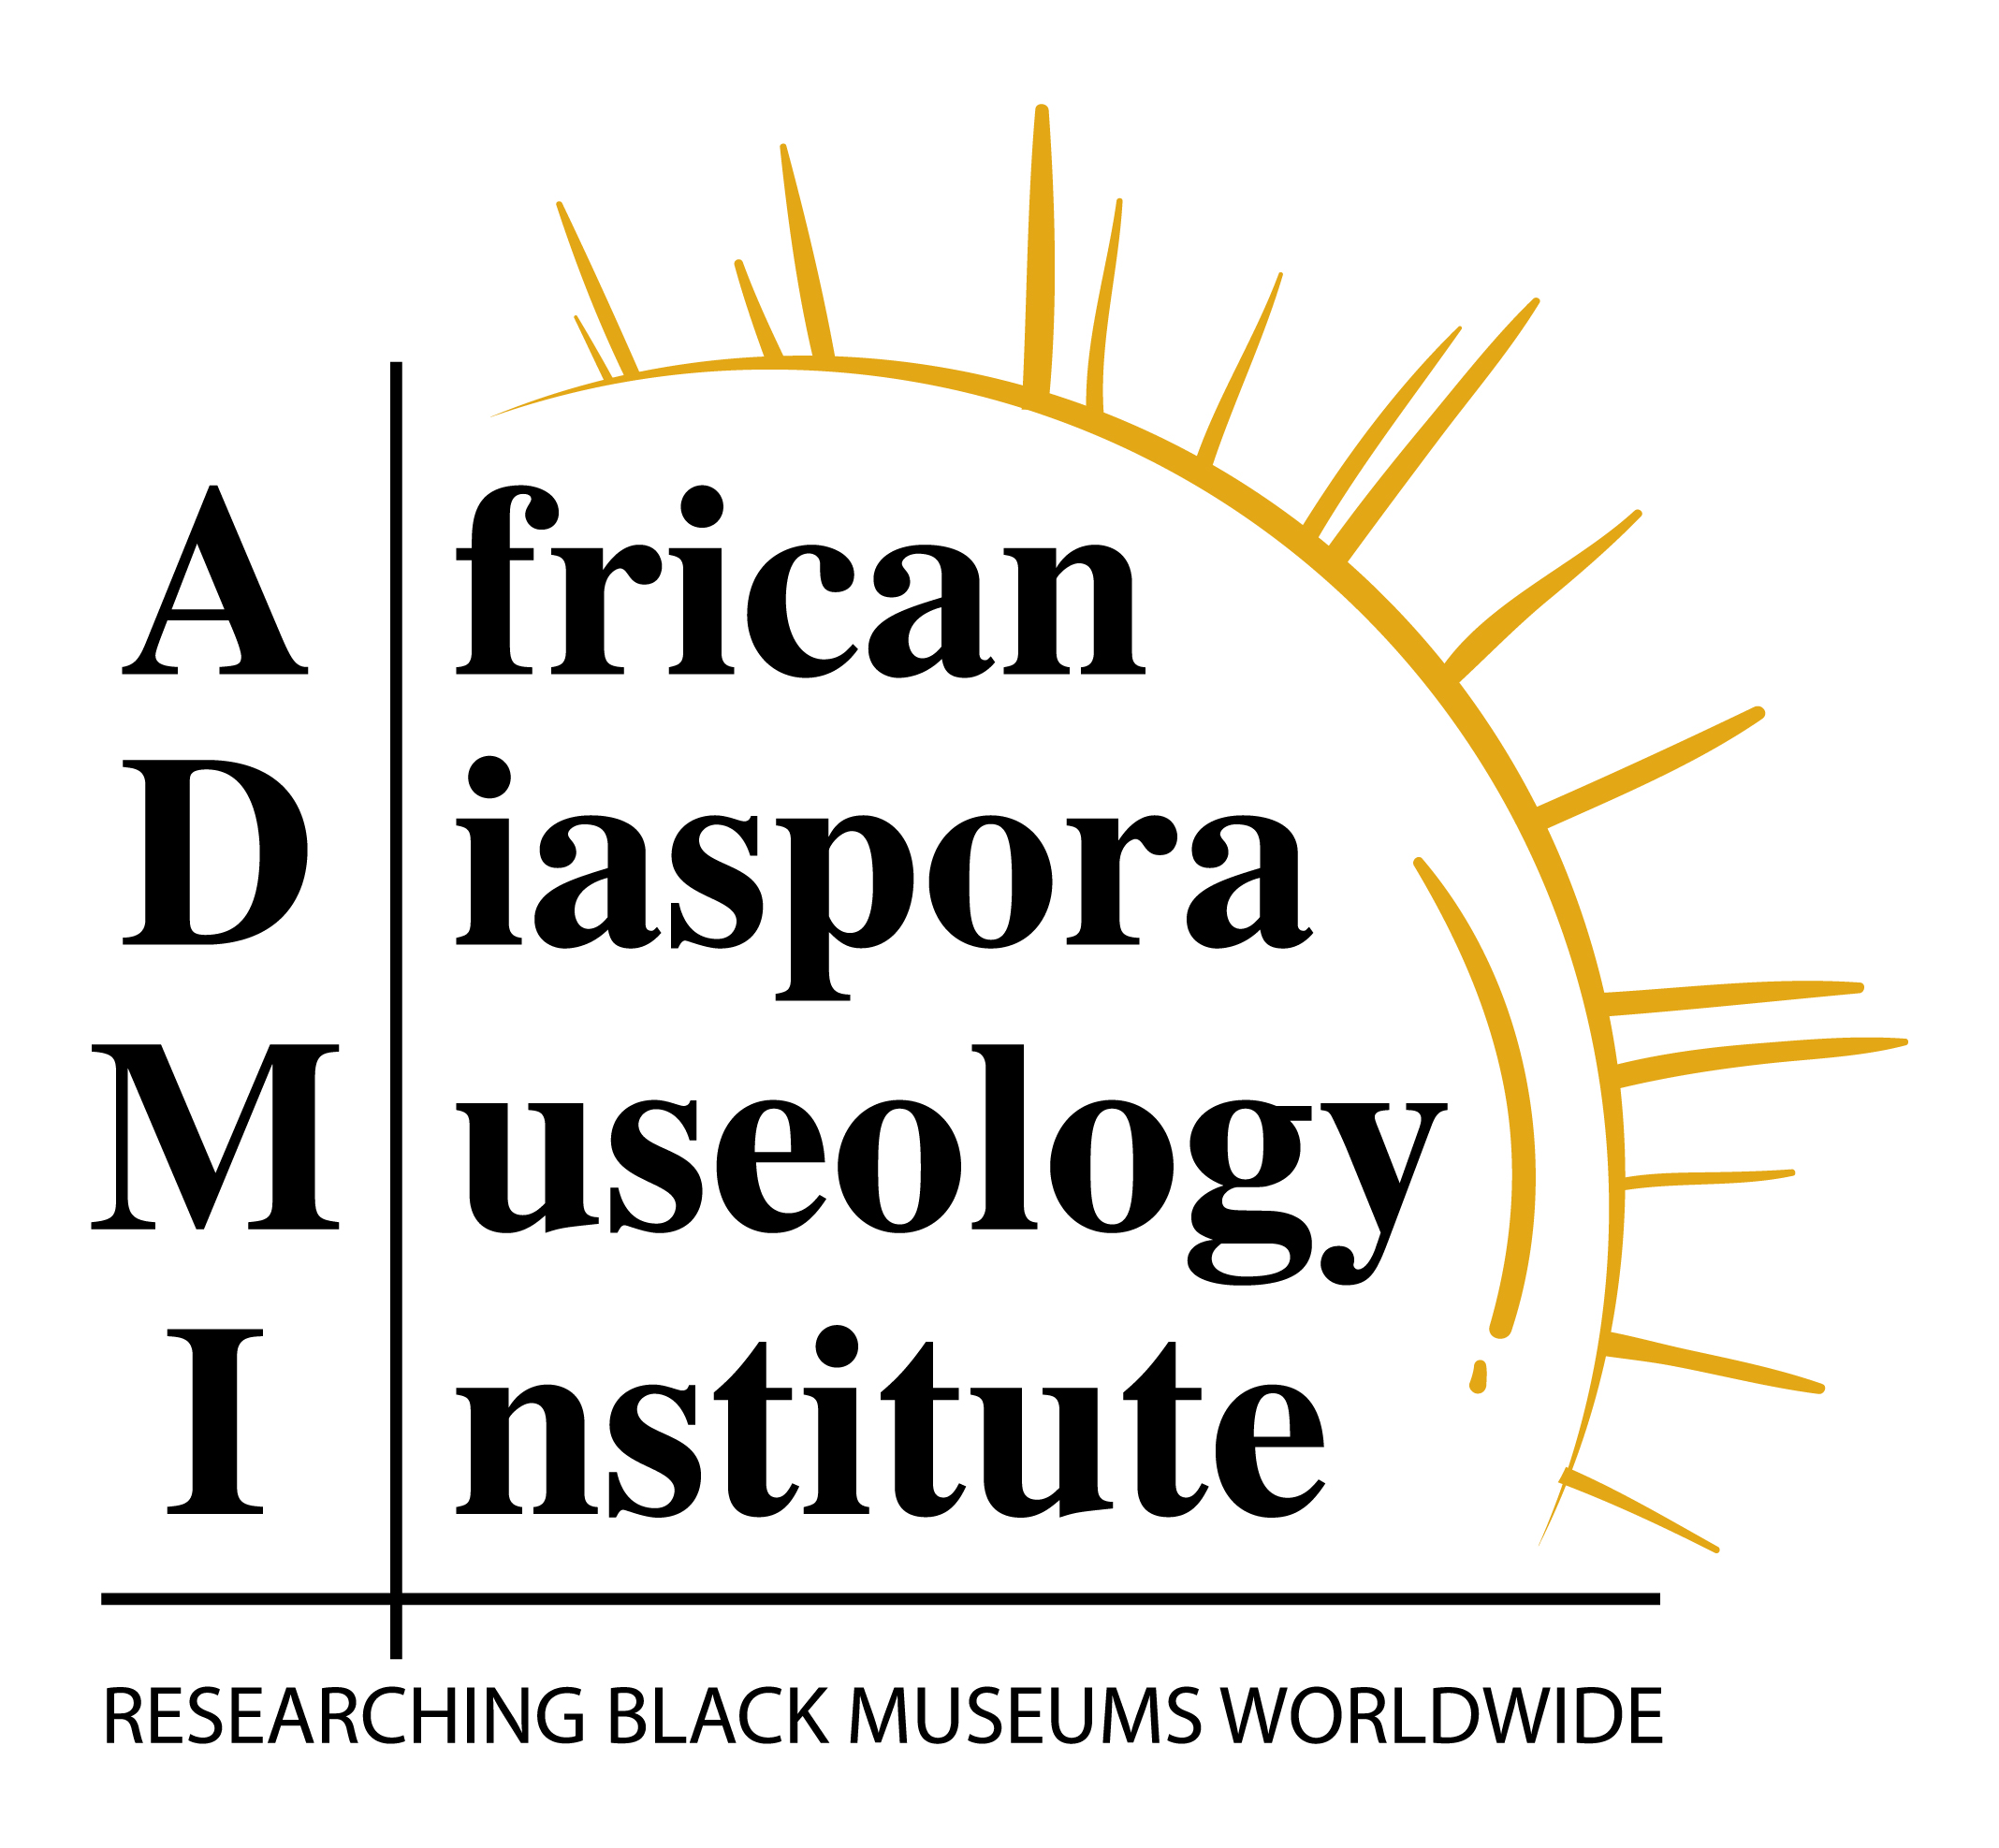 African Diaspora Museology Institute Final Files #6